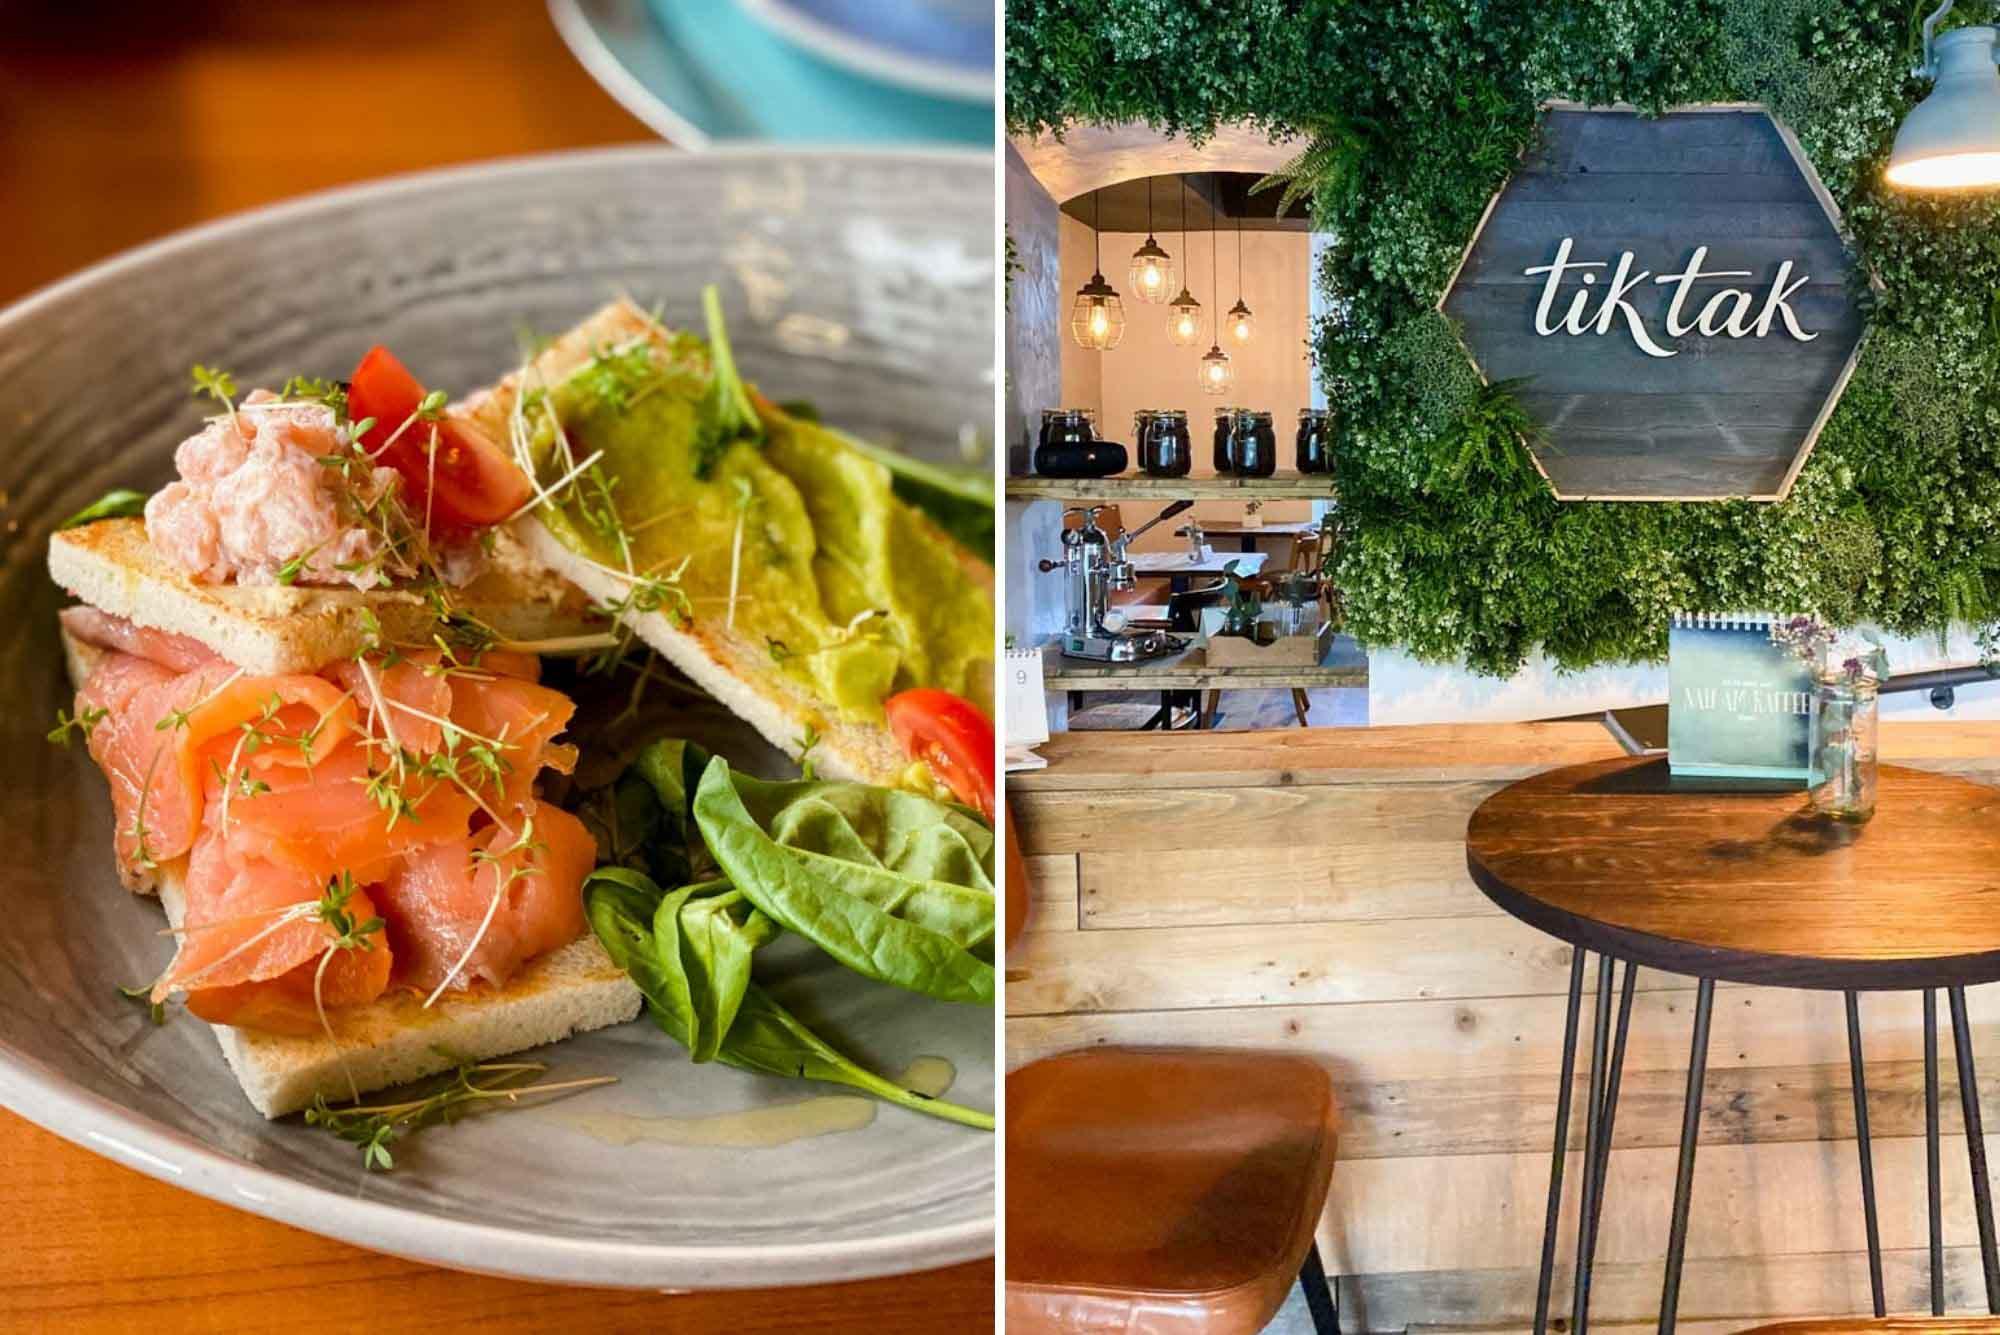 Frühstücken in Linz: Meine Lieblingslokale zum Brunchen